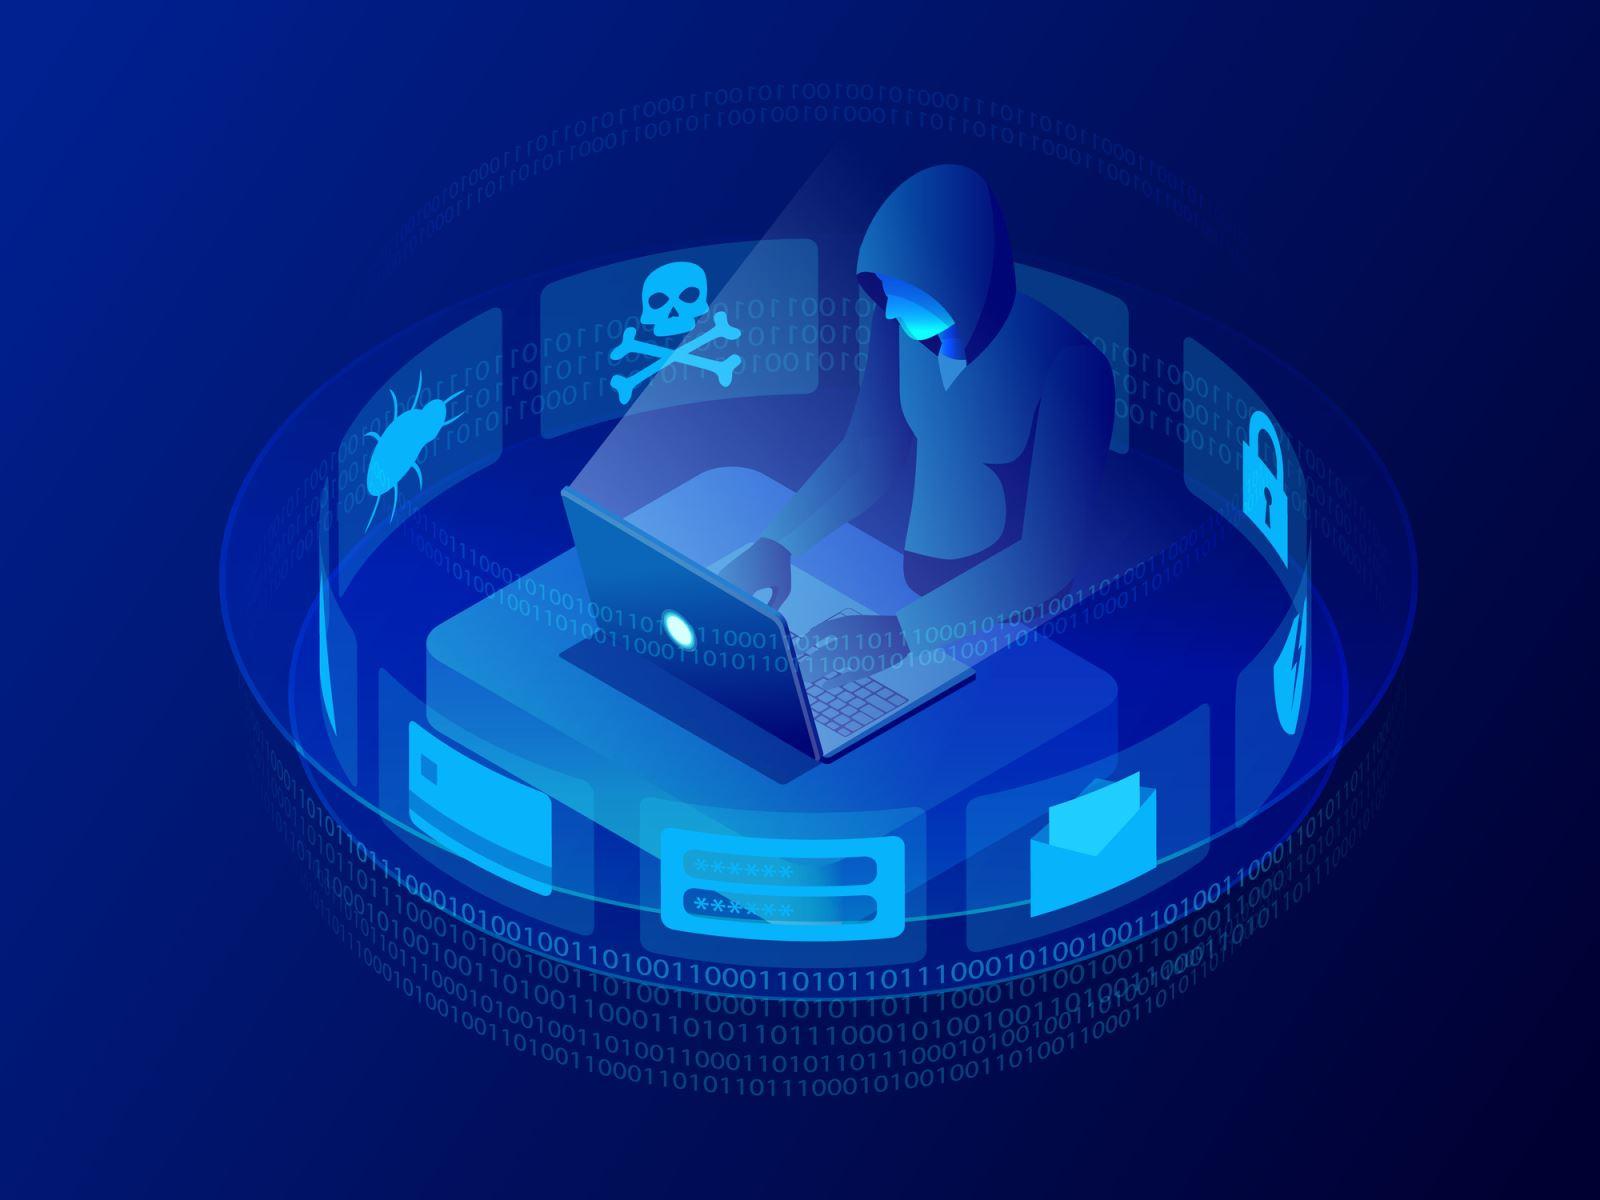 Dealing with digital threats